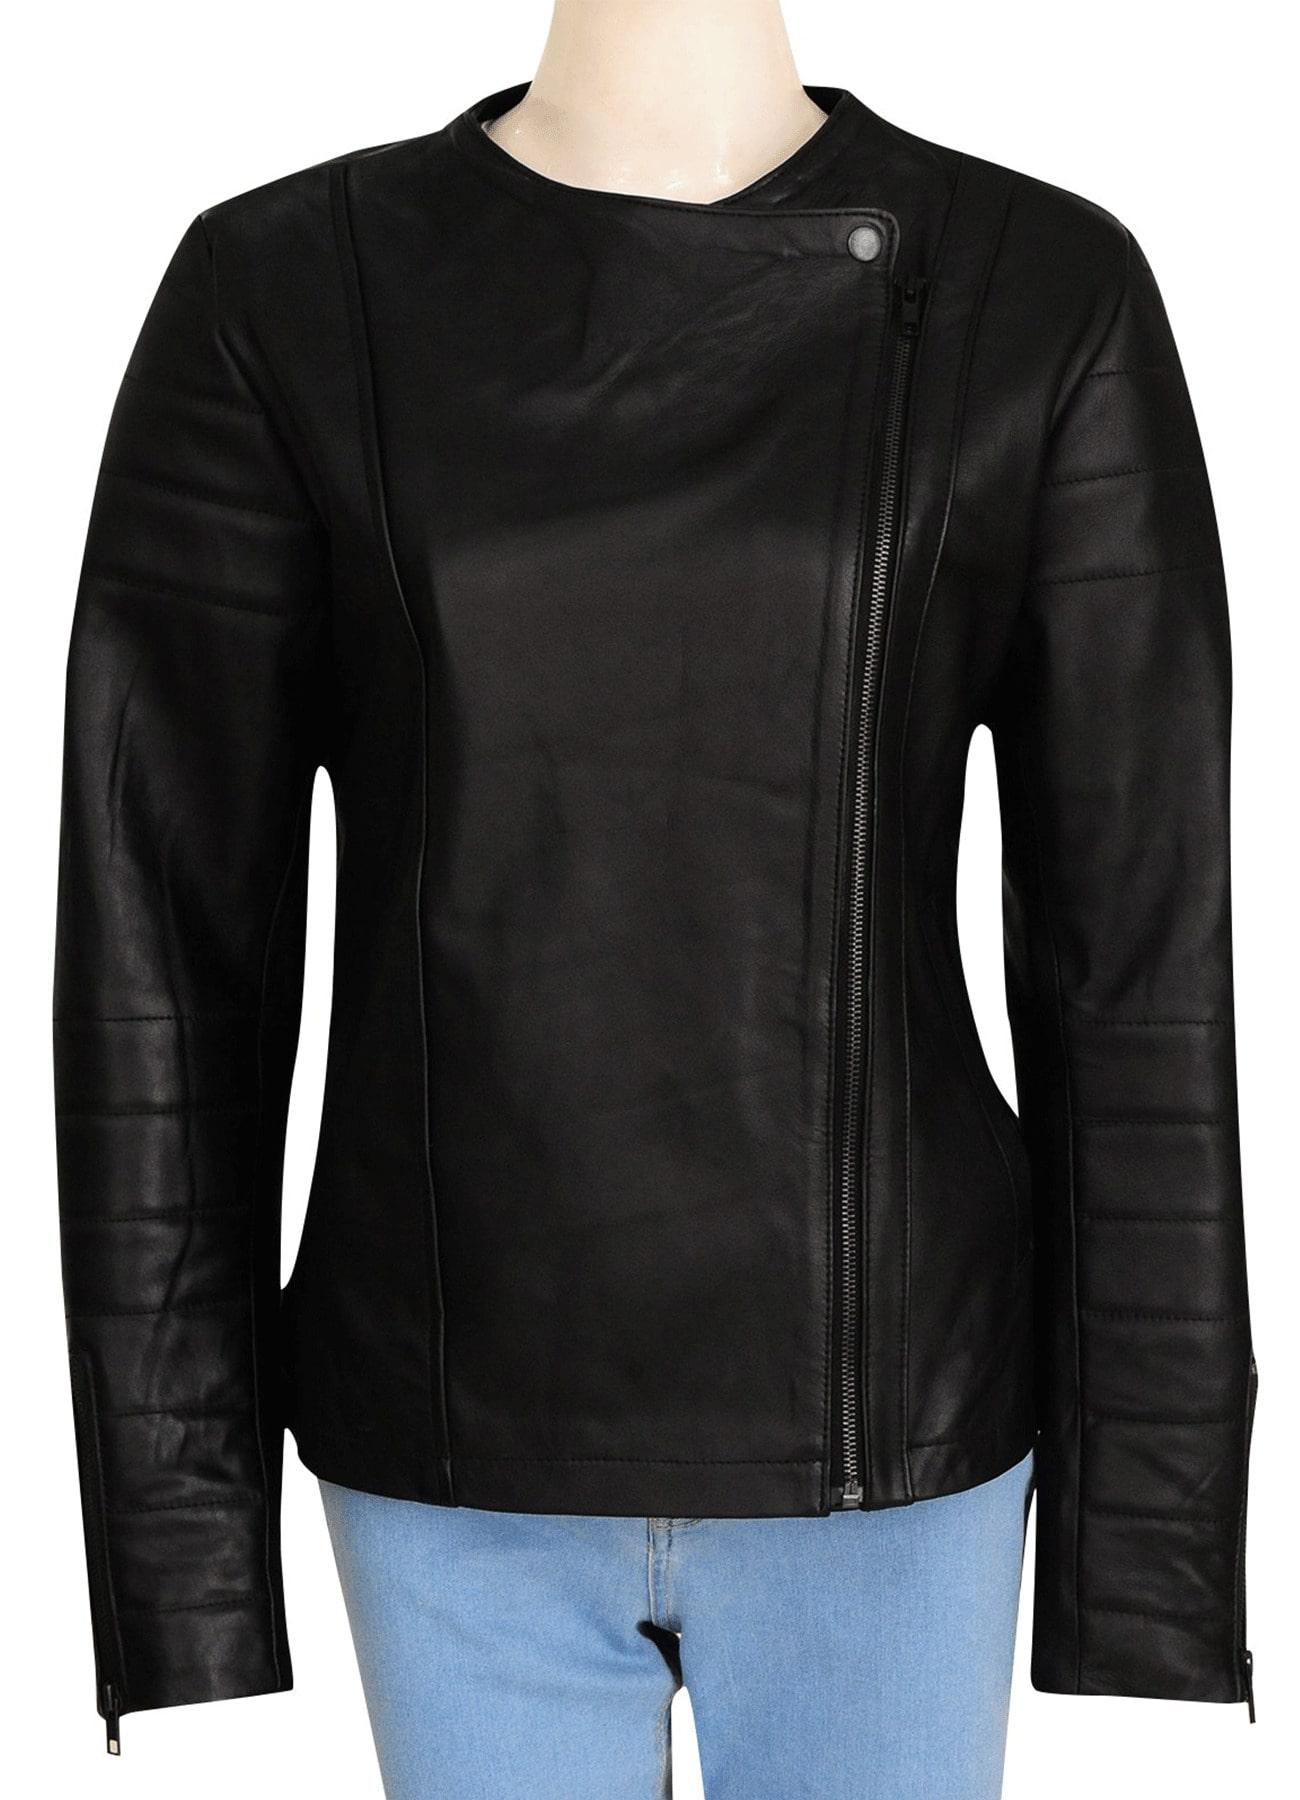 Jenna Coleman Doctor Who Series Genuine Leather Black Jacket